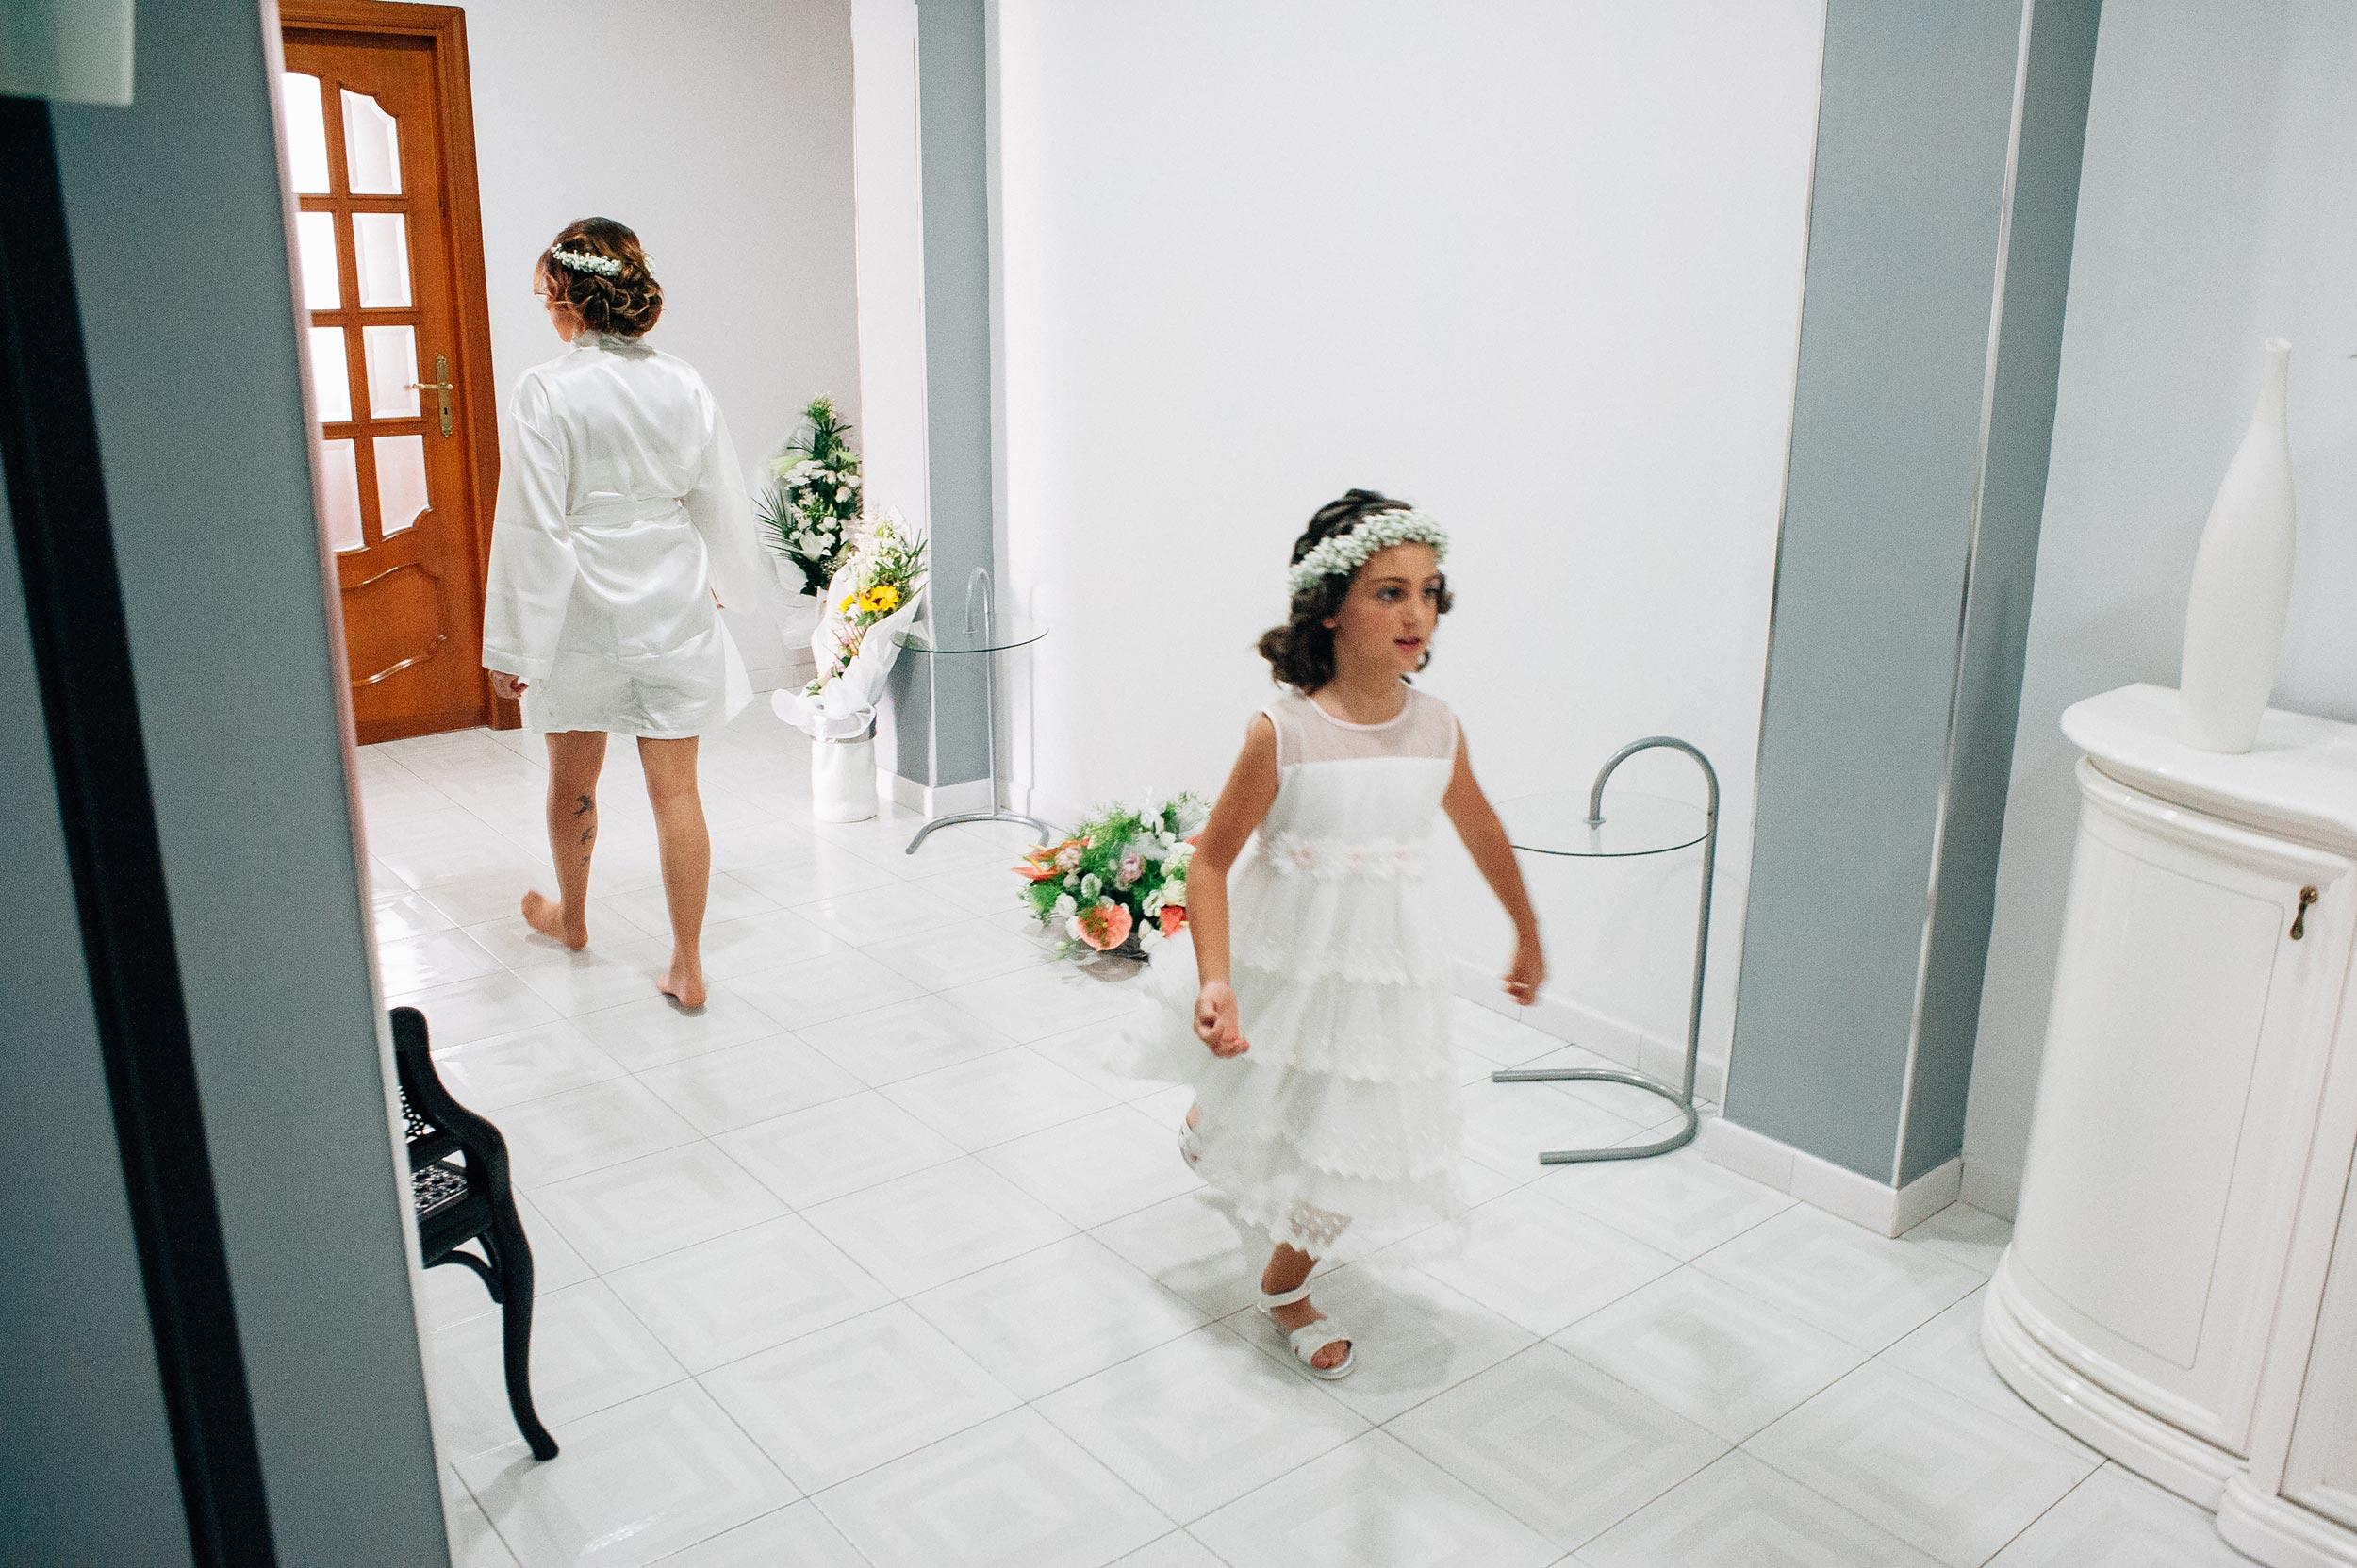 2016-Claudio-Teresa-Naples-Wedding-Photographer-Italy-Alessandro-Avenali-16.jpg